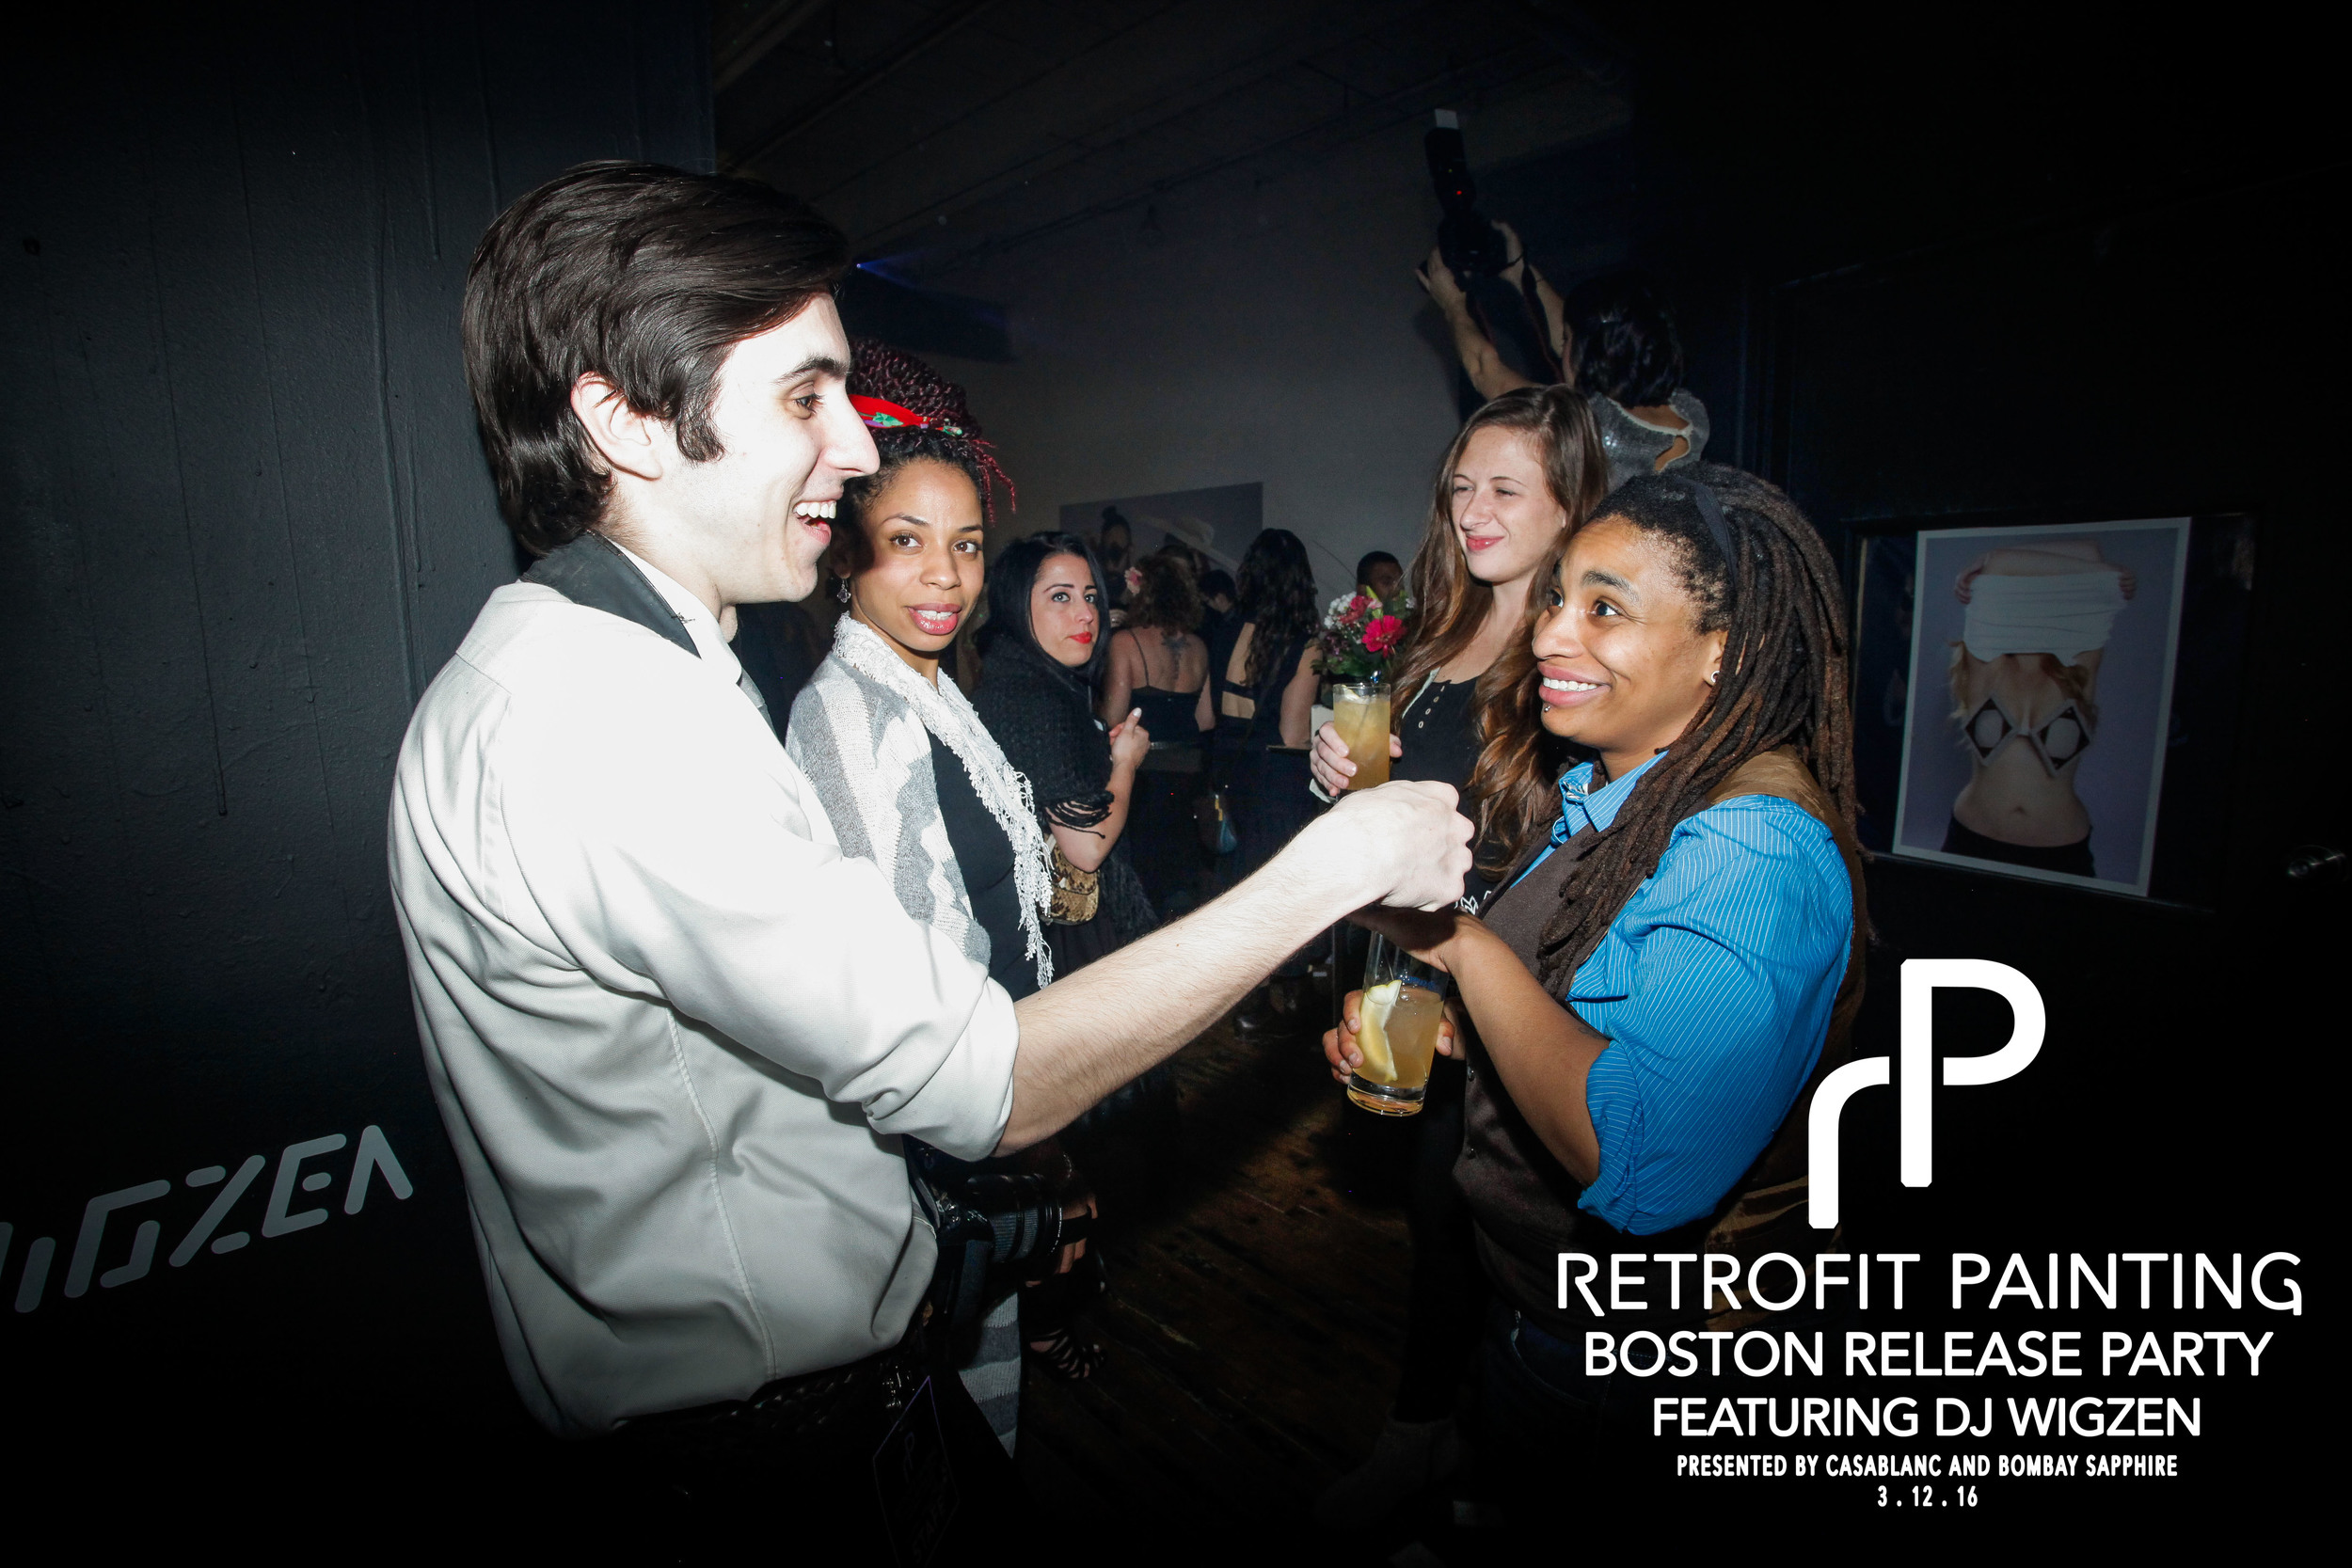 Retrofit Painting Boston Release Party 0118.jpg